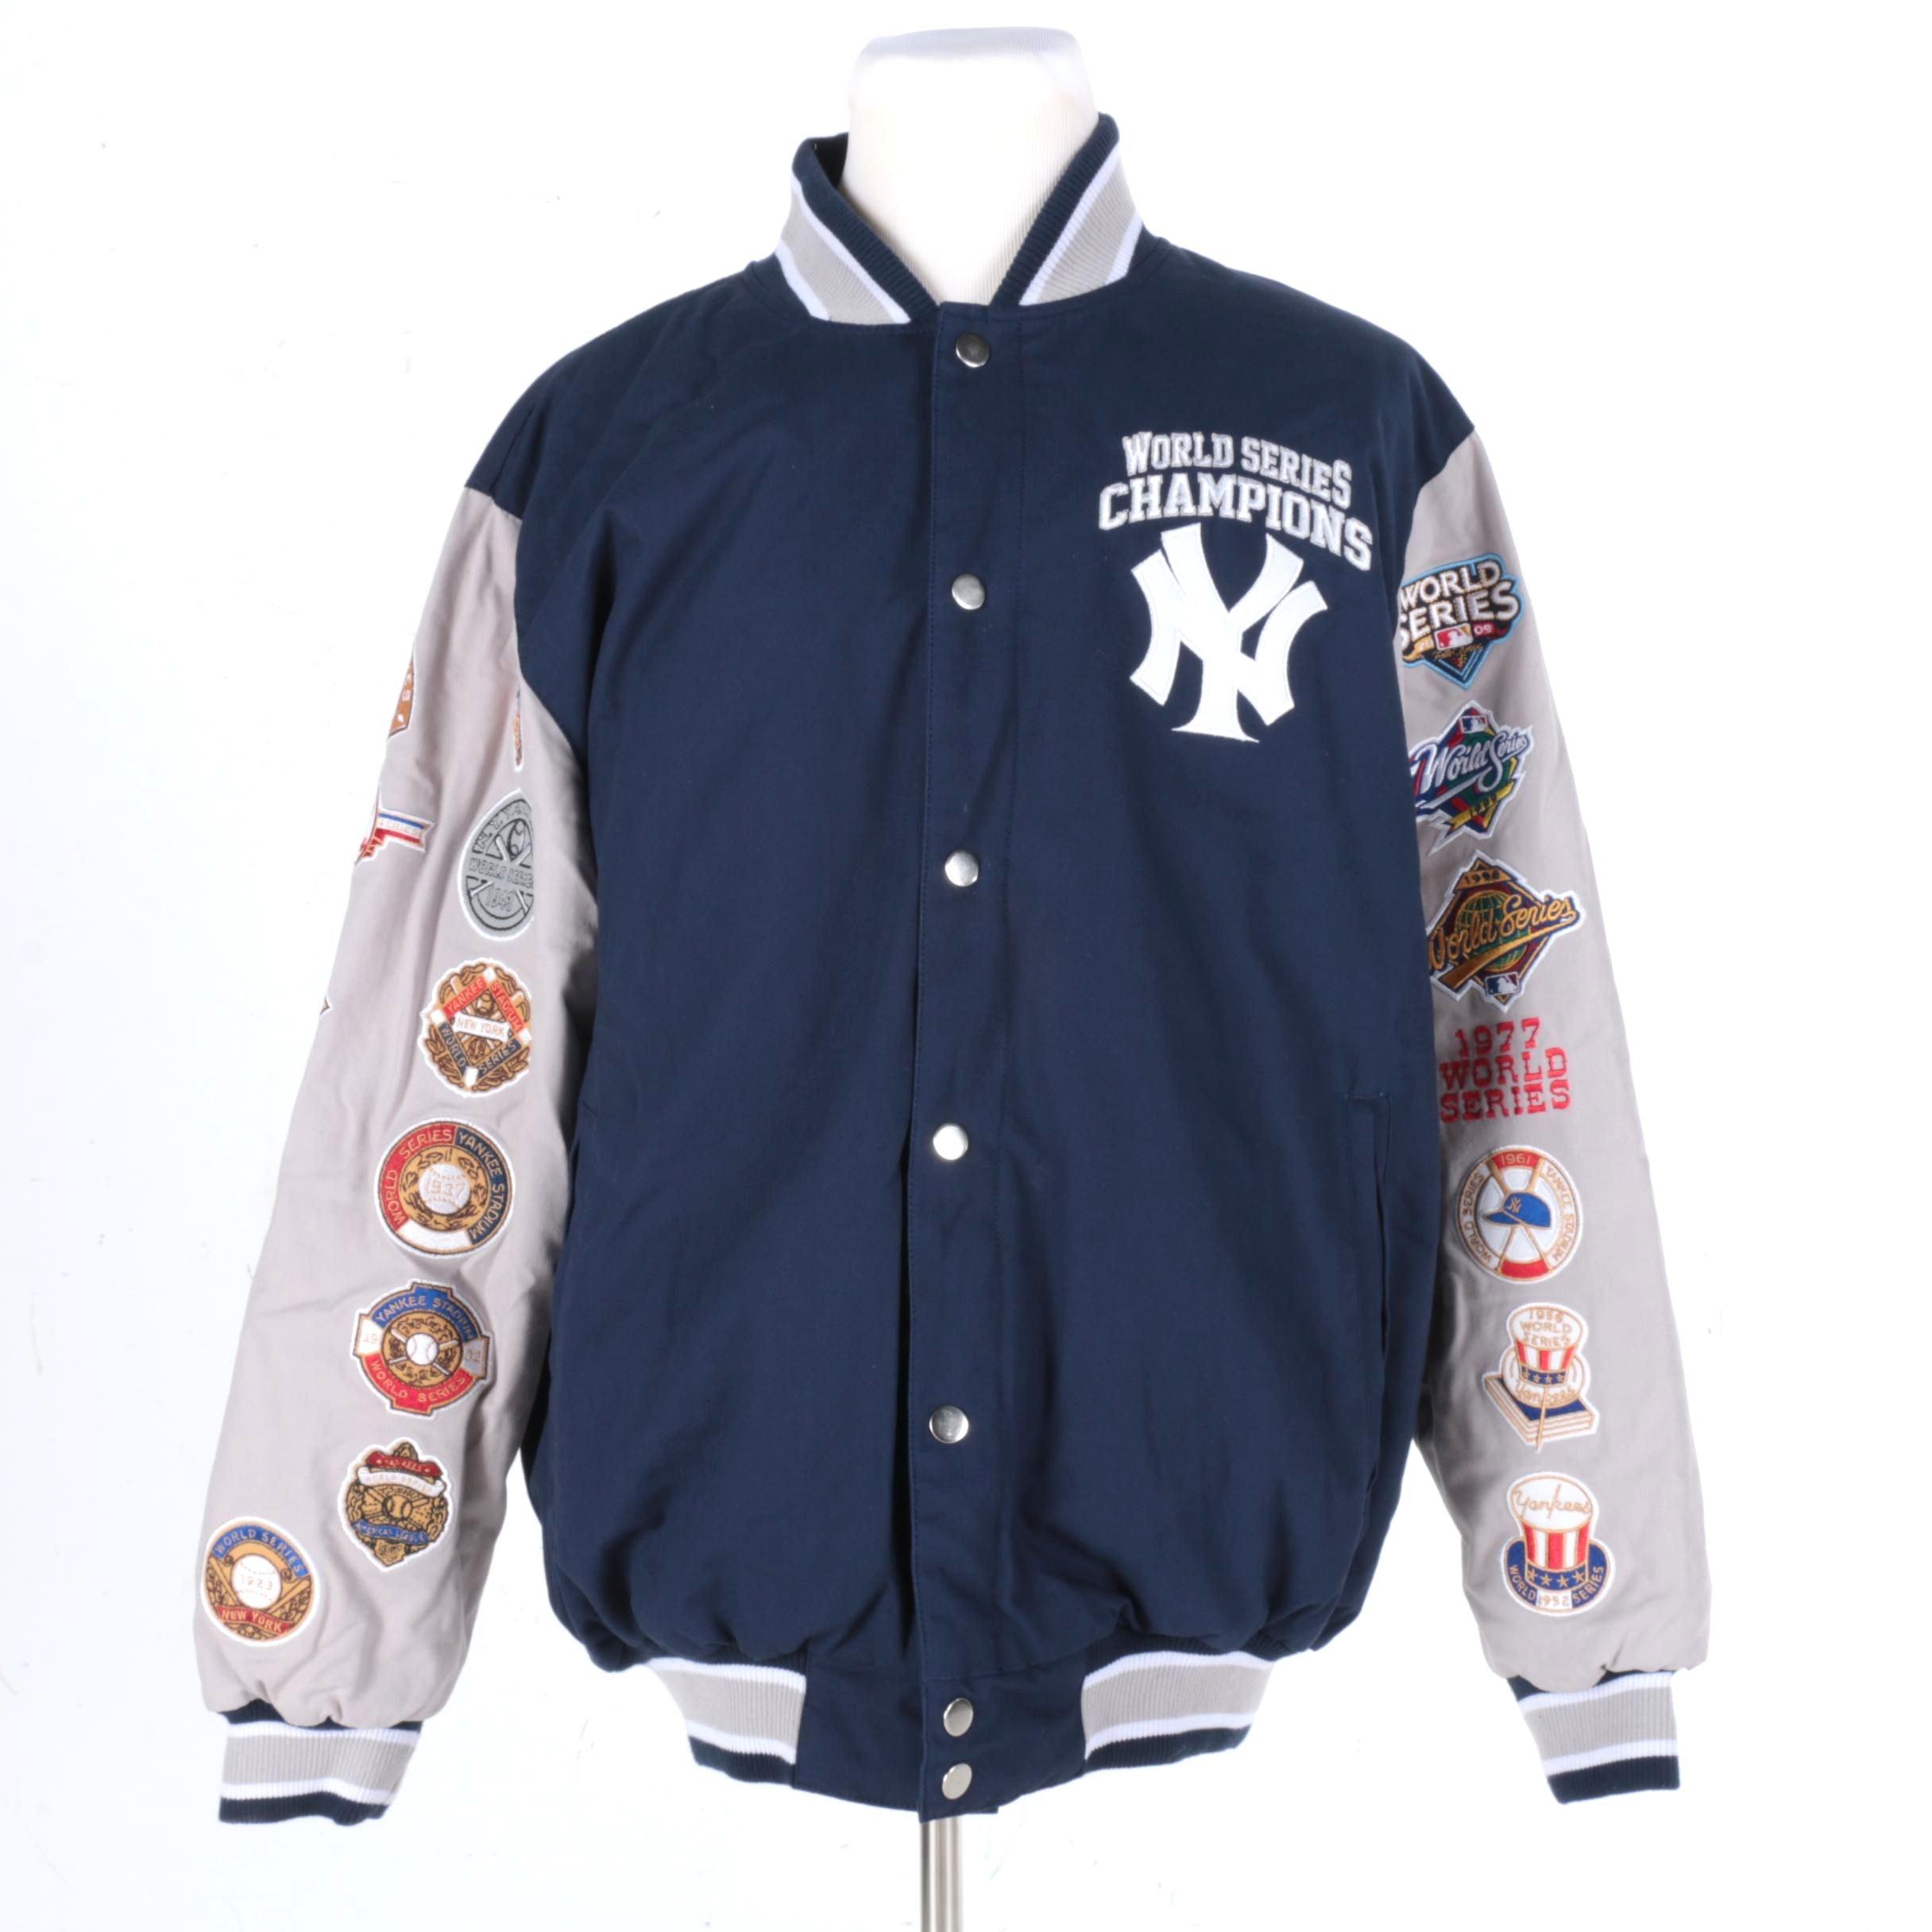 New York Yankees World Series Champions Jacket Ebth